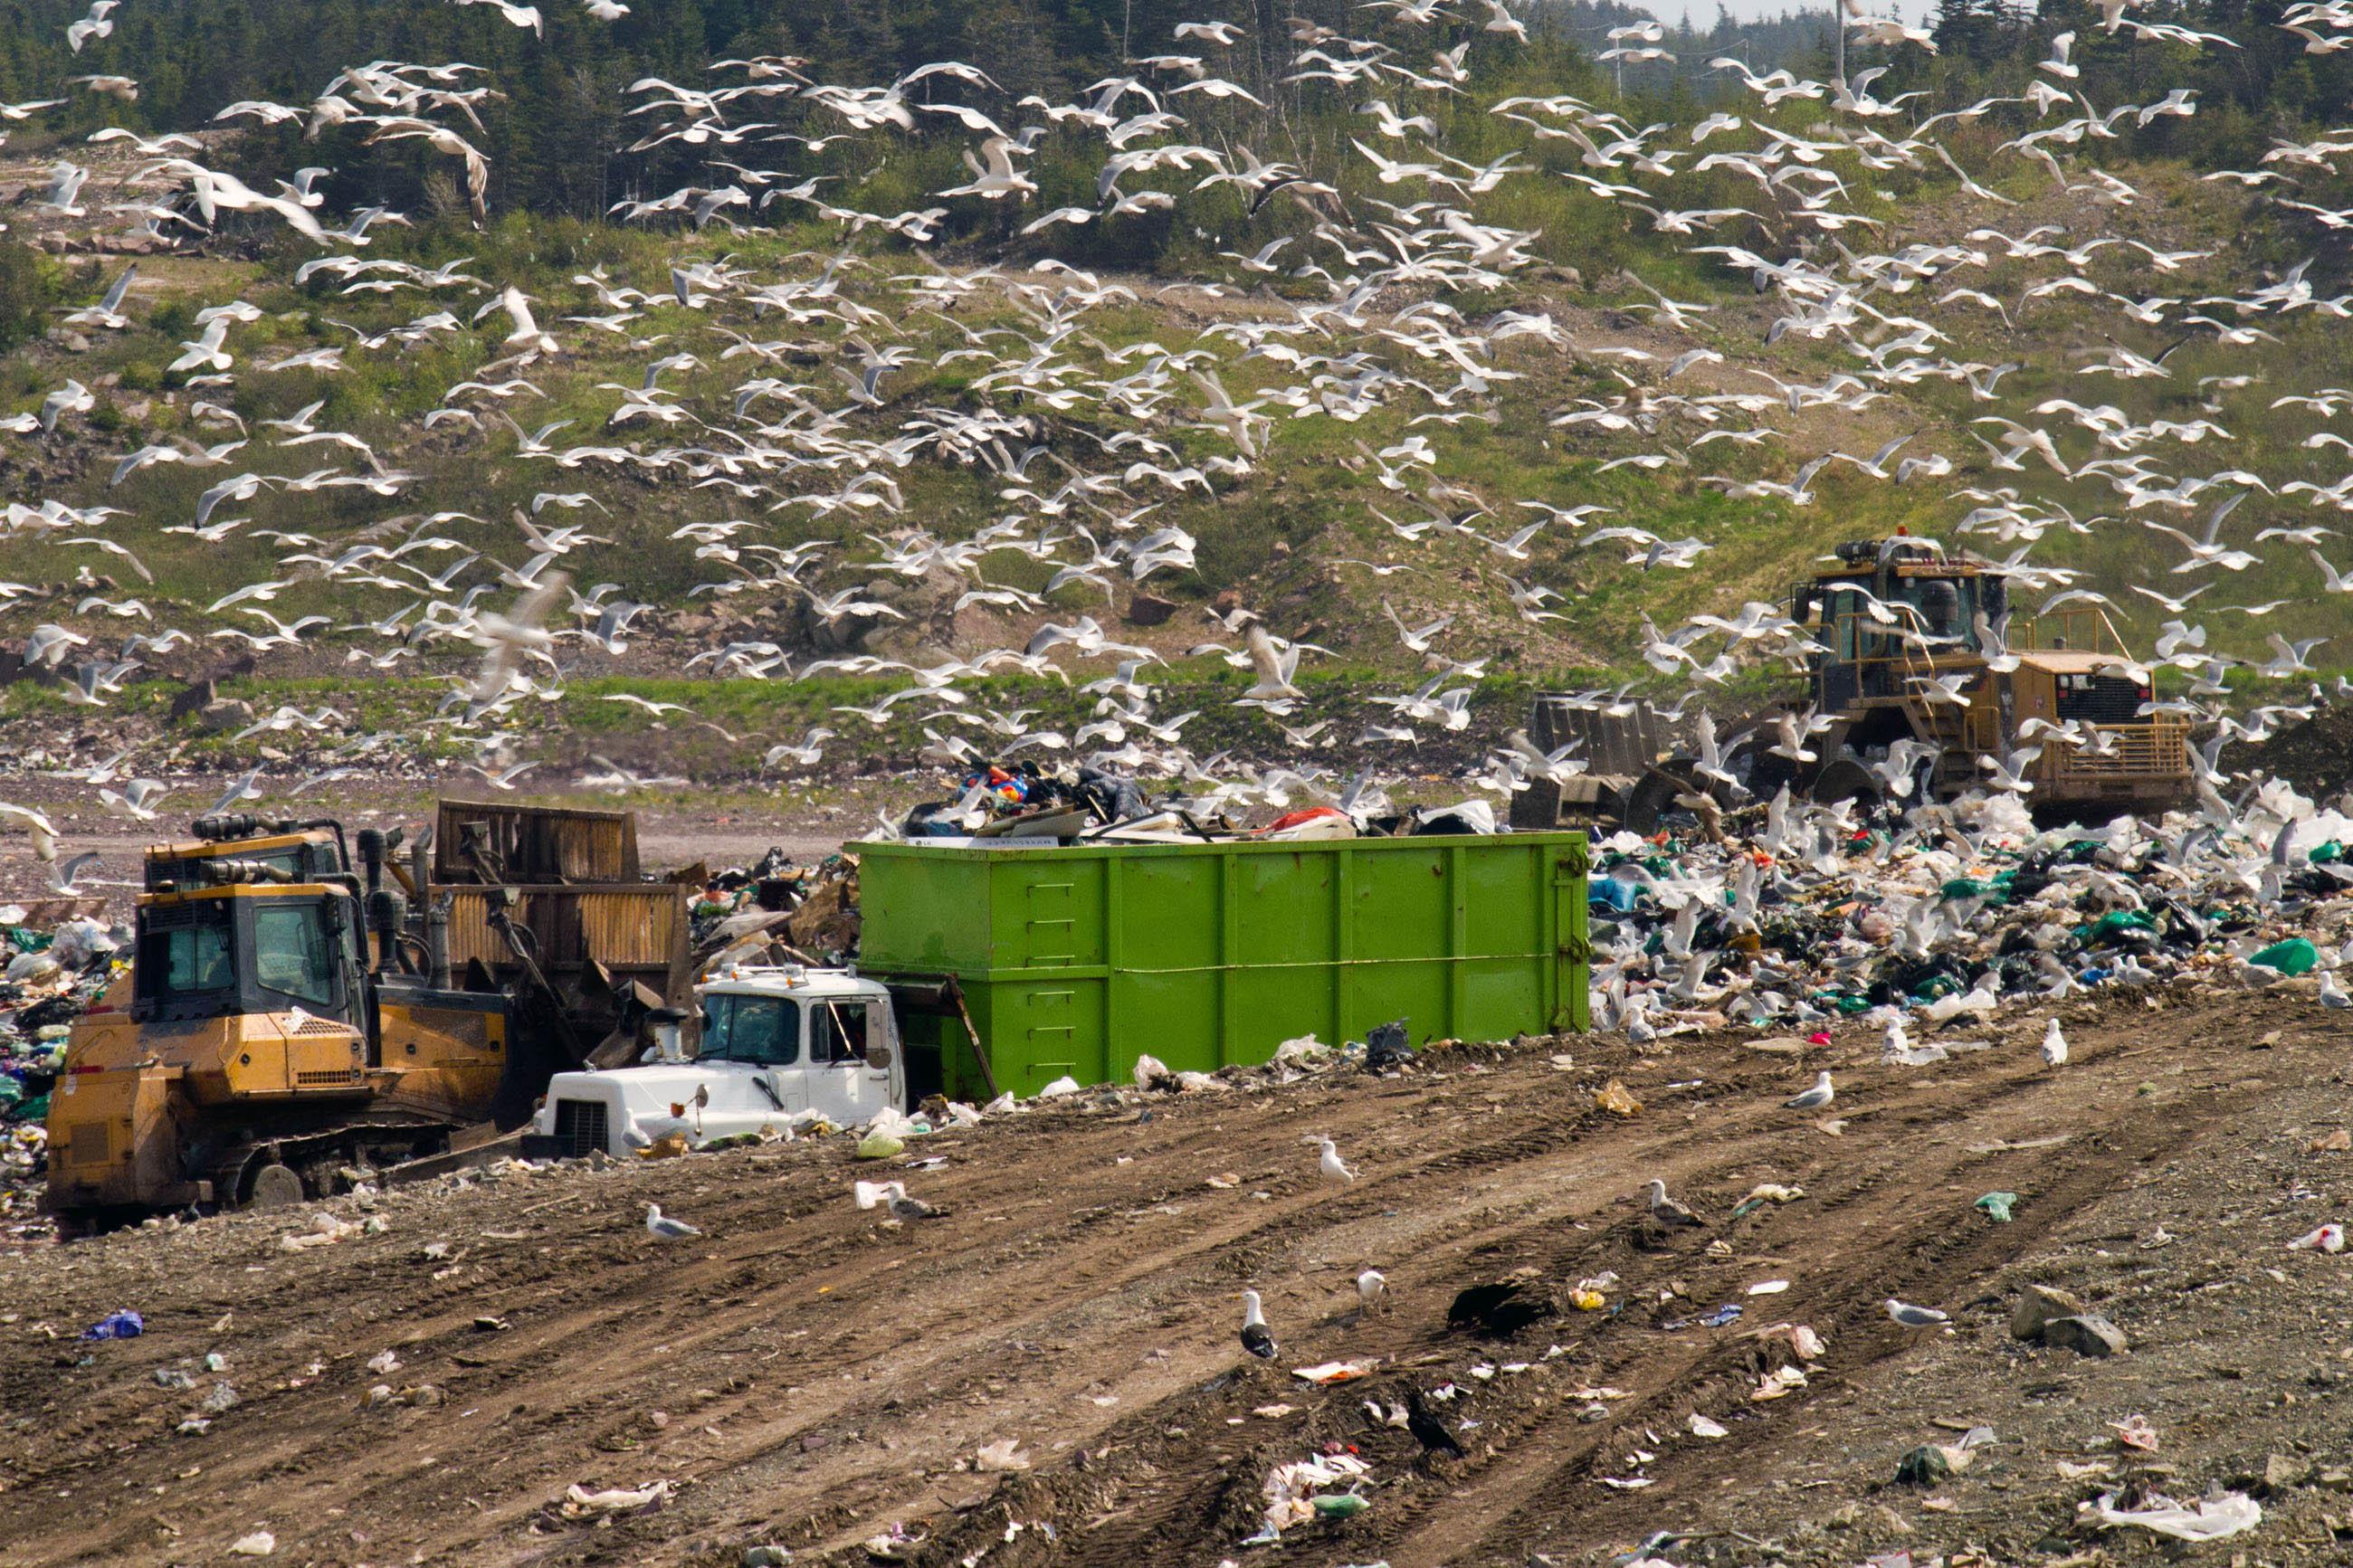 Landfill Equipment, Bulldozer, Outdoors, Wasteful, Waste, HQ Photo